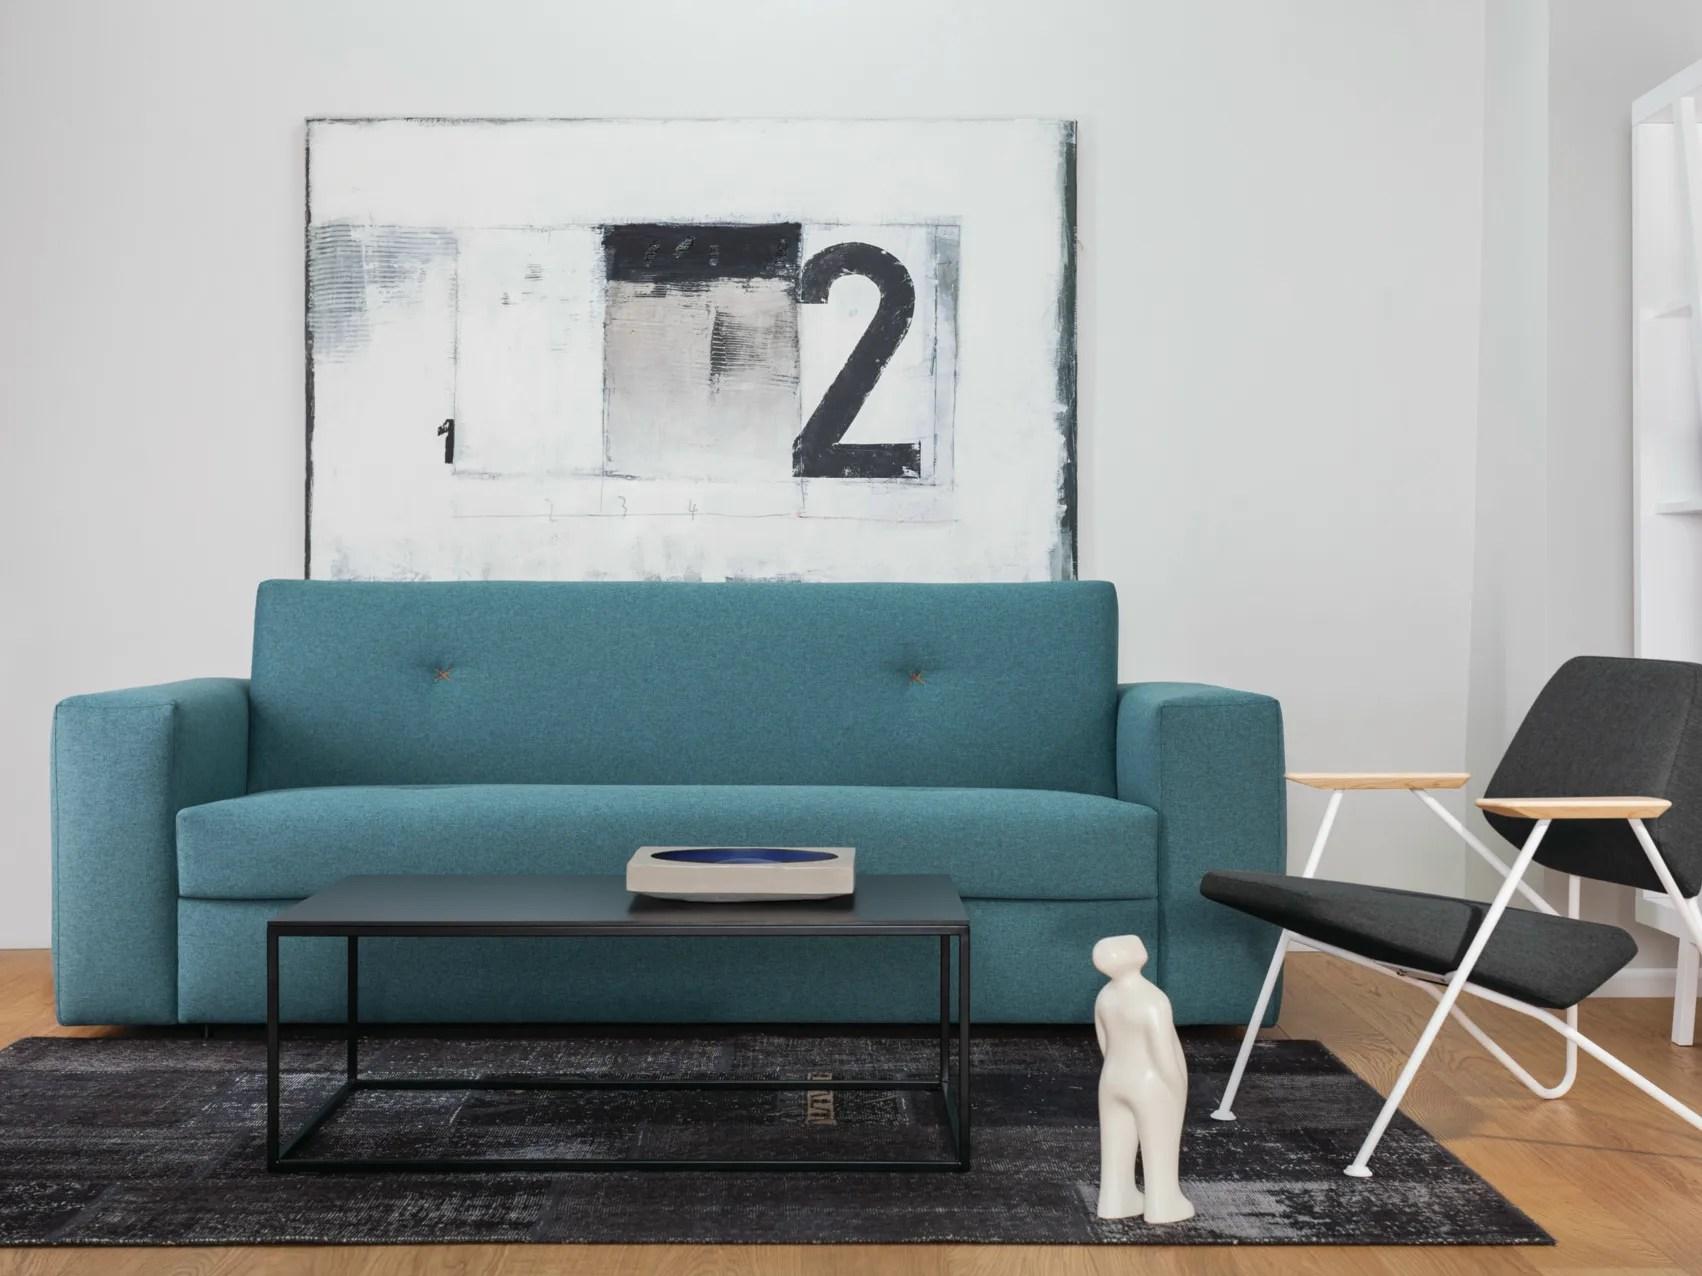 simple sofa bed sofargen 1 crema a cosa serve easy by prostoria ltd